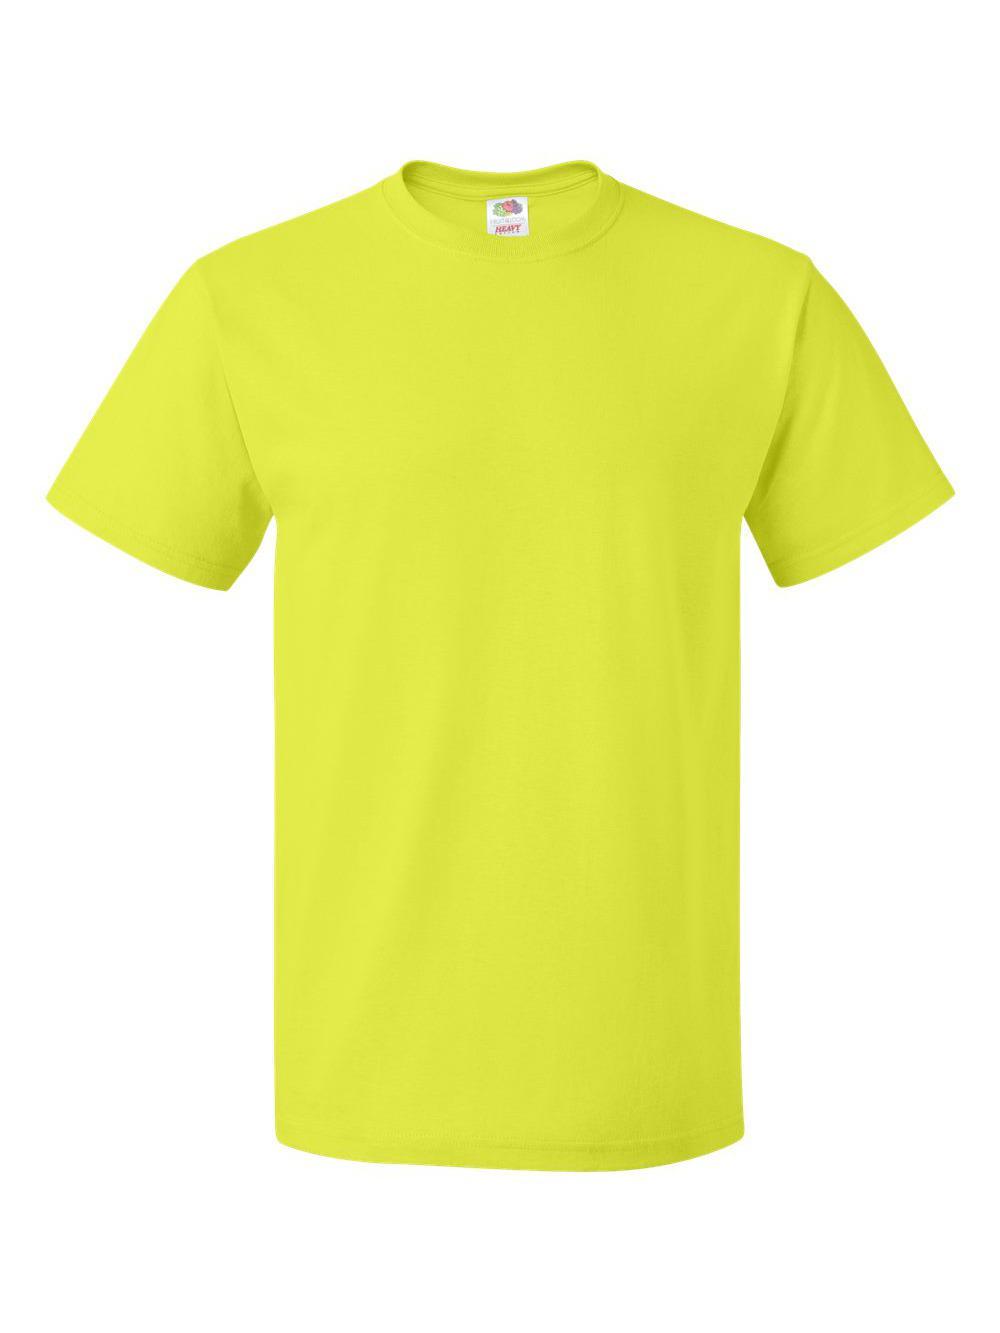 Fruit-of-the-Loom-HD-Cotton-Short-Sleeve-T-Shirt-3930R thumbnail 117